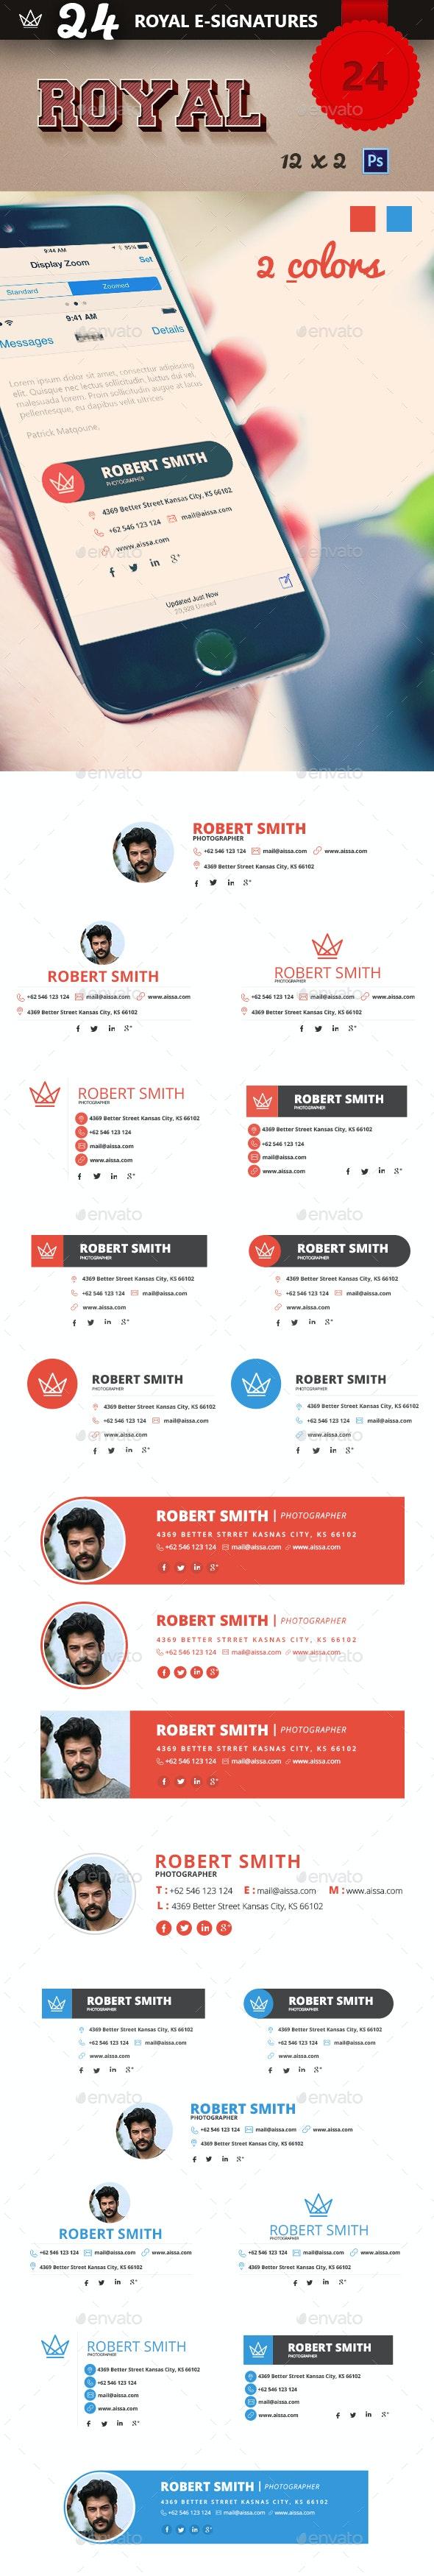 Royal 24 Professional E-Signatures - Miscellaneous Web Elements